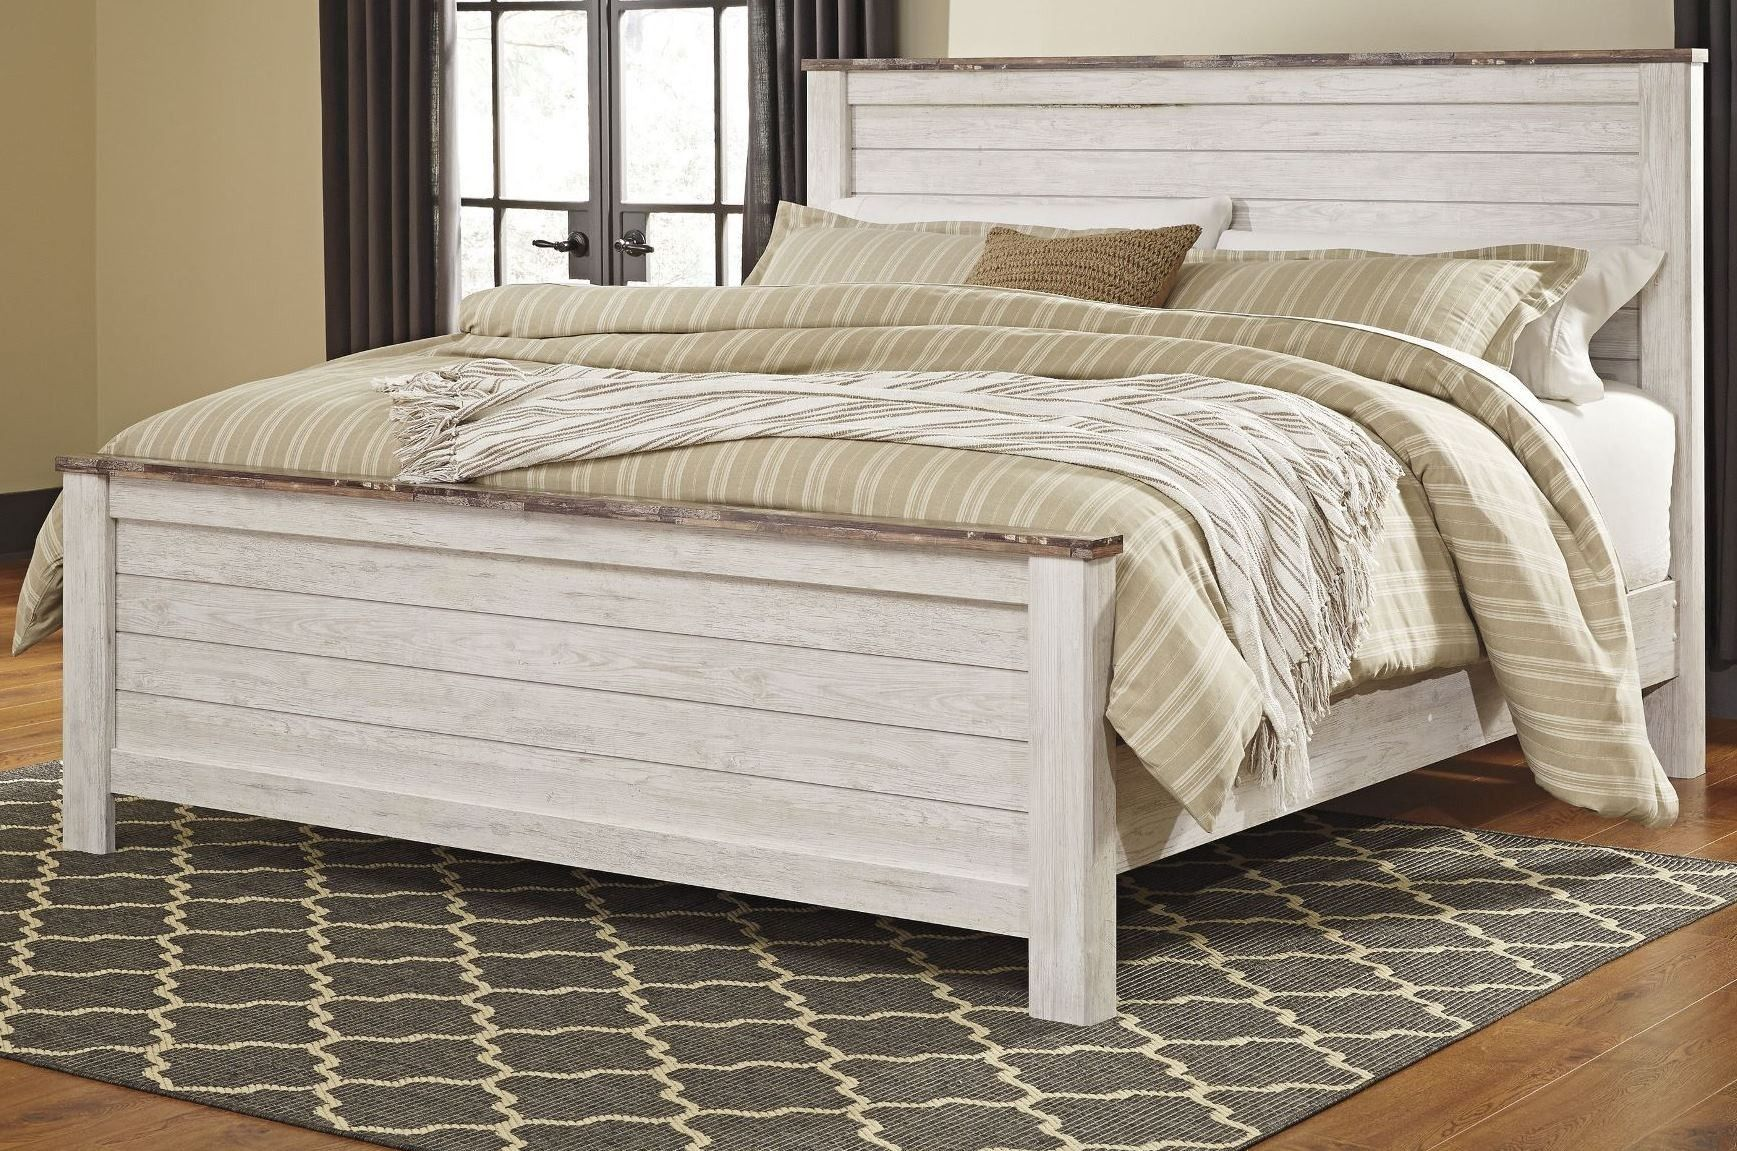 Willowton Whitewash King Panel Bed Bedroom furniture